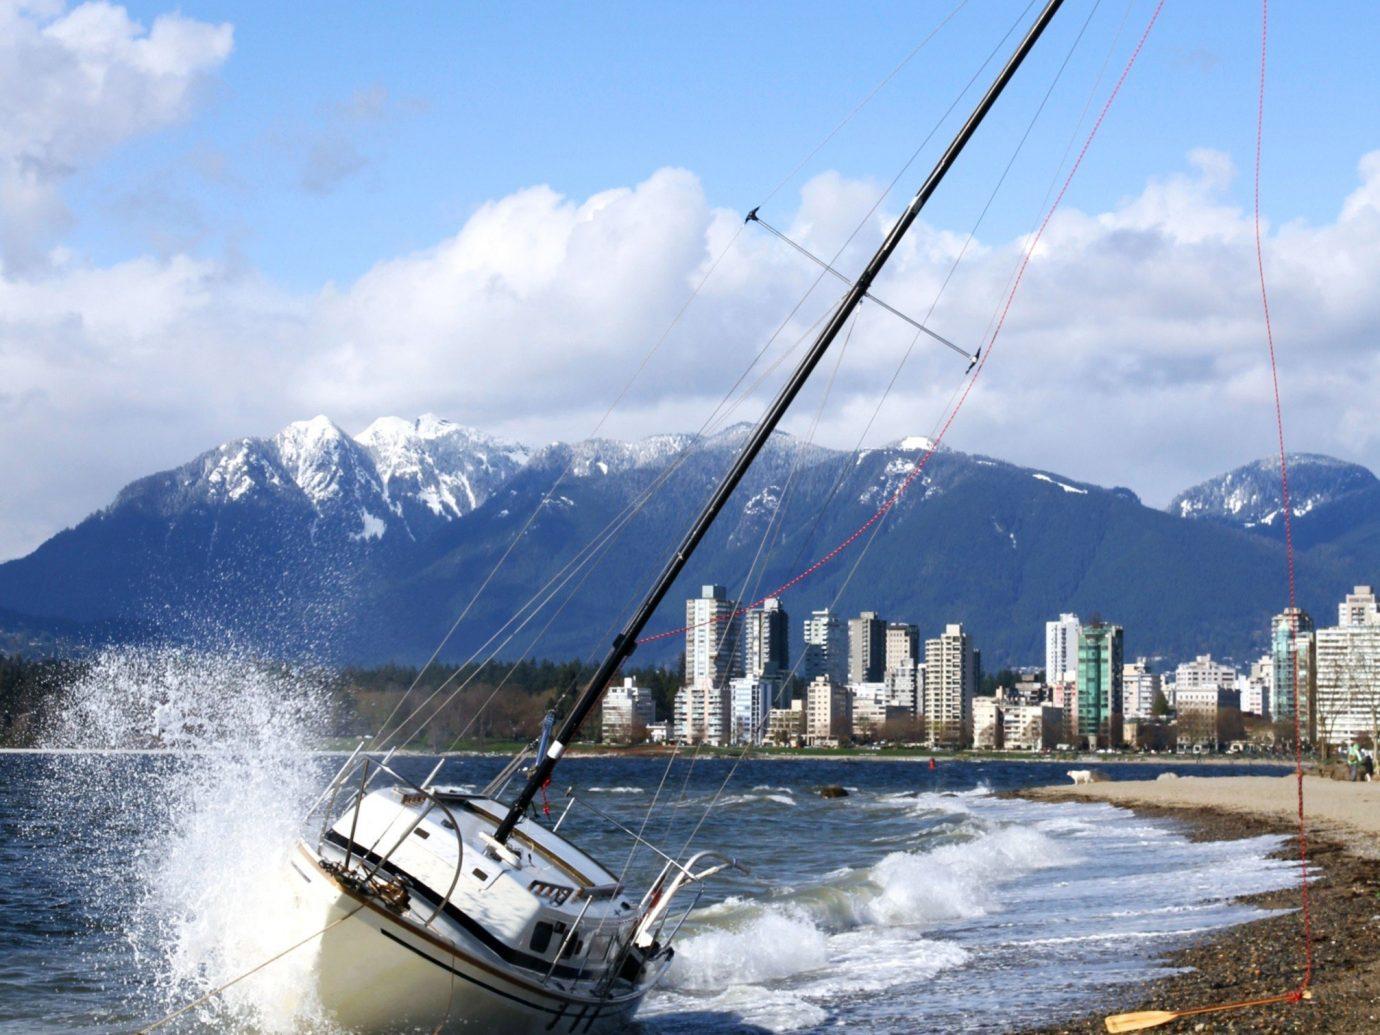 Offbeat outdoor sky water Boat vehicle Sea Coast sailboat sailing sail boating watercraft mast bay wind day